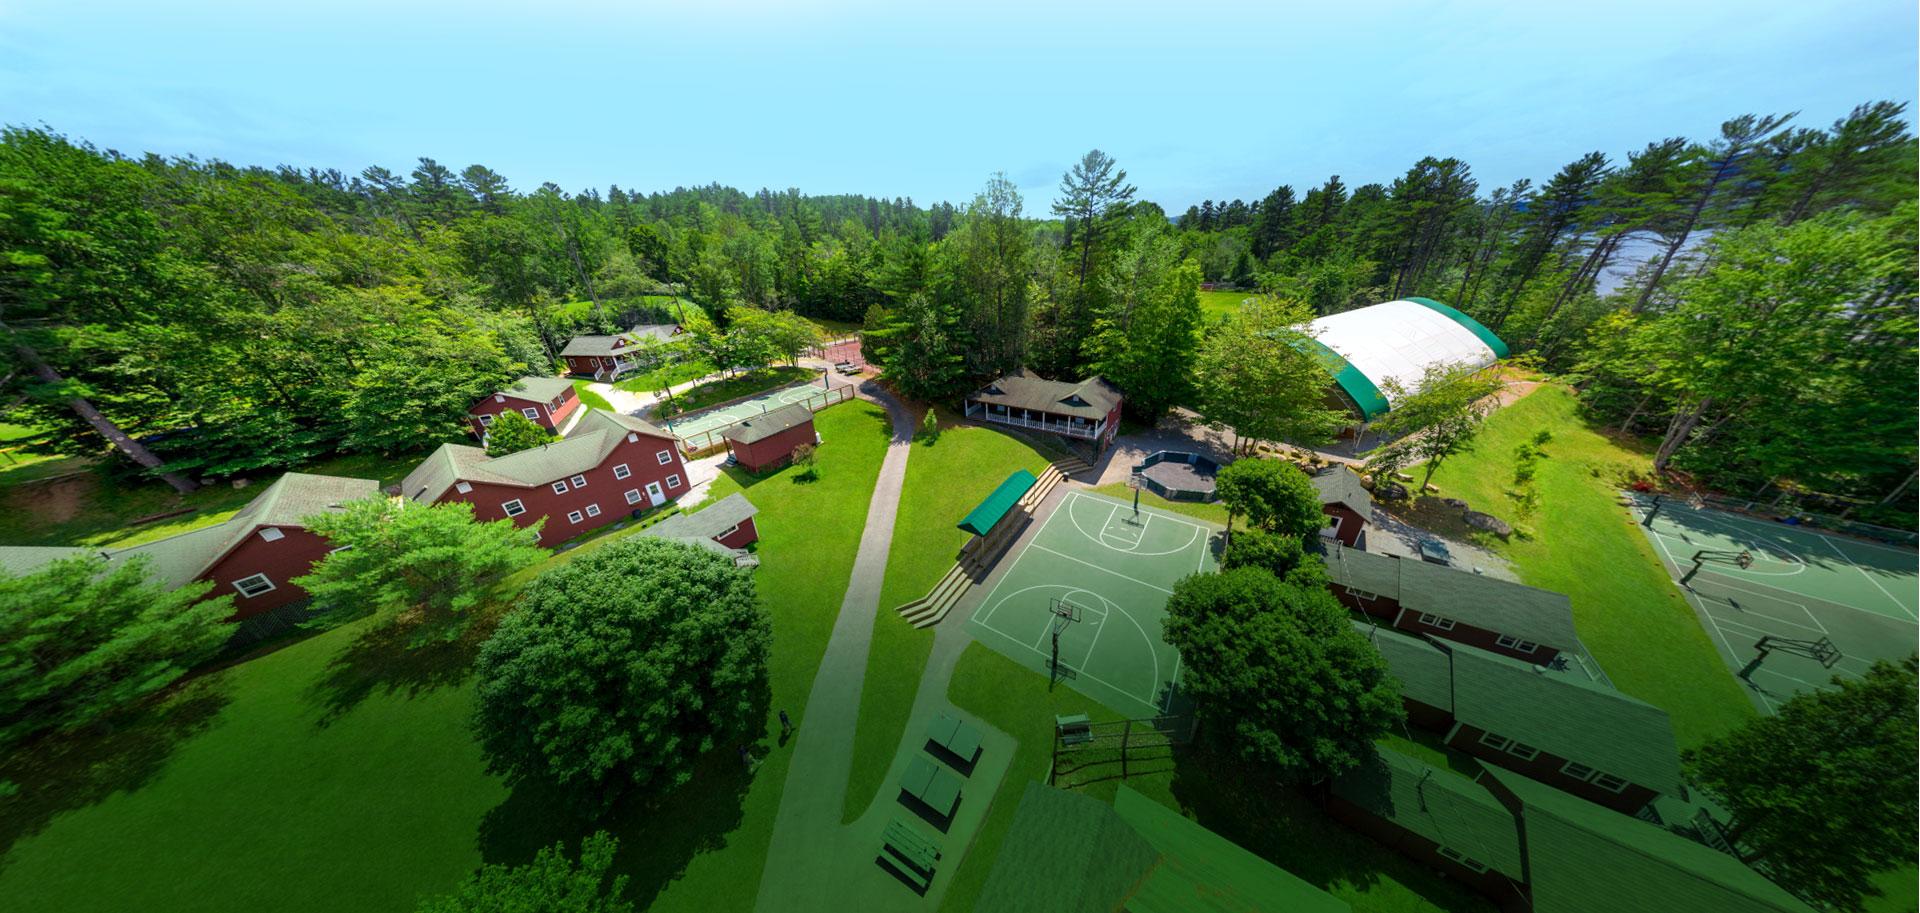 Brant Lake summer camp campus facilities